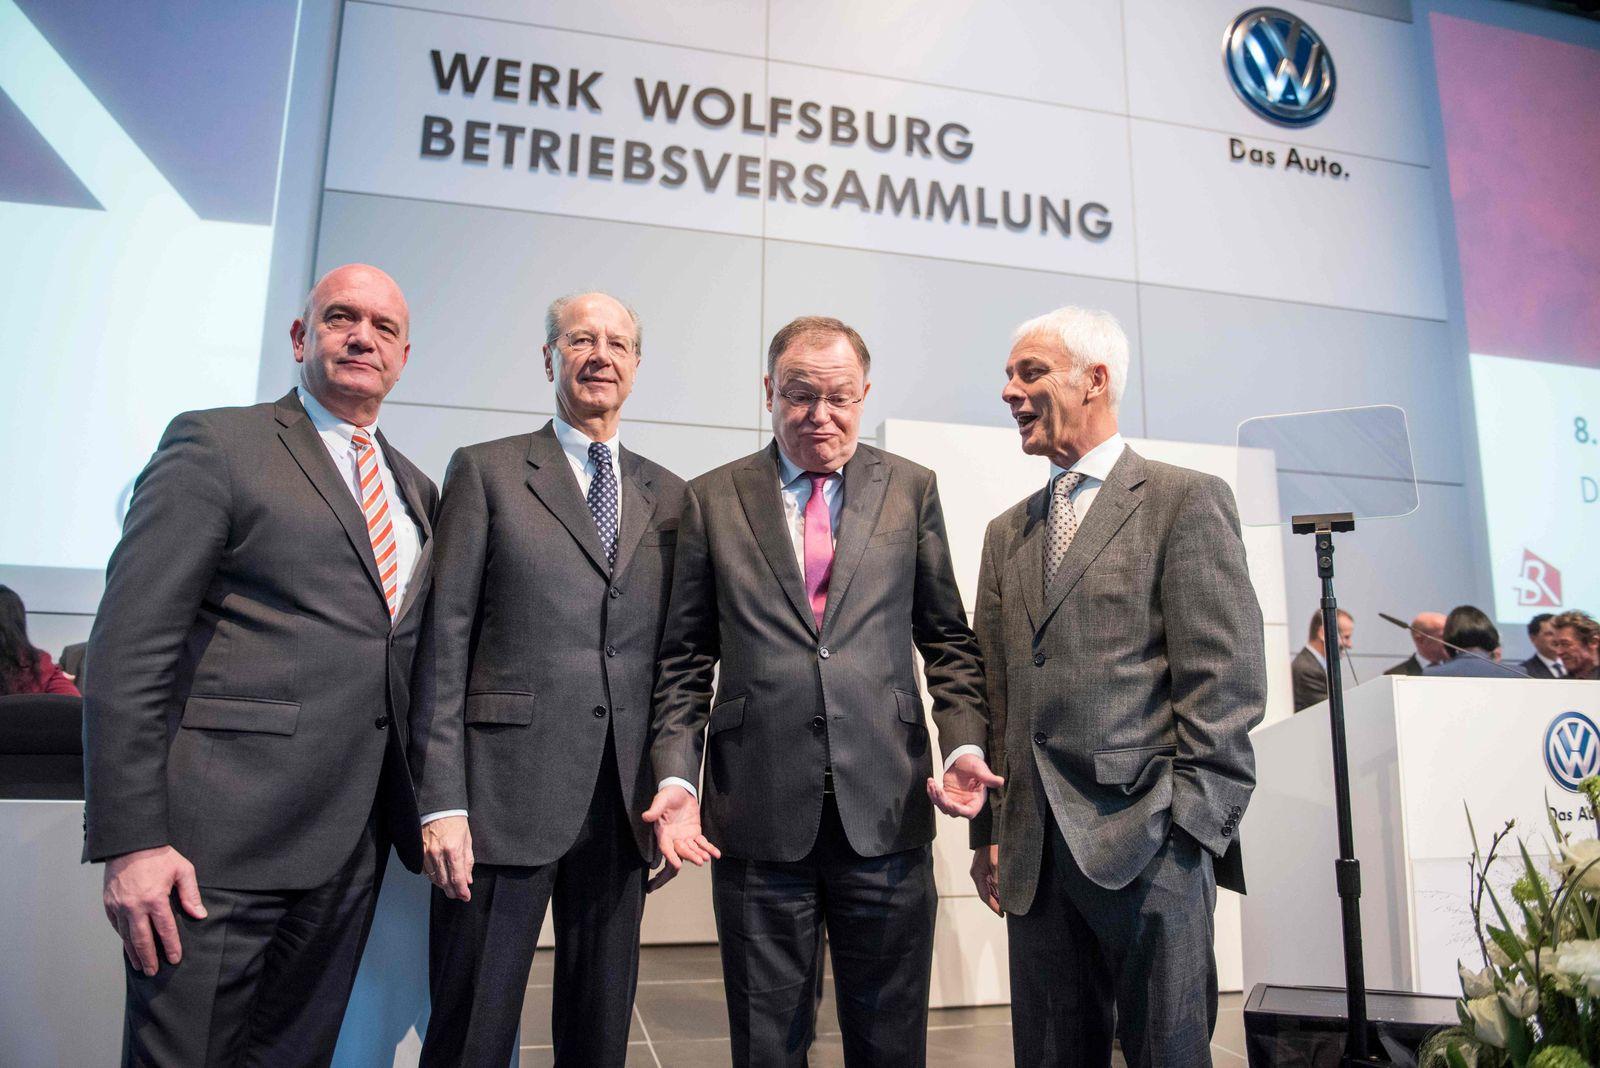 Volkswagen Betriebsversammlung / FBL-EUR-C1-GER-BEL-WOLFSBURG-GENT-GERMANY-TRANSPORT-US-INVESTIGA